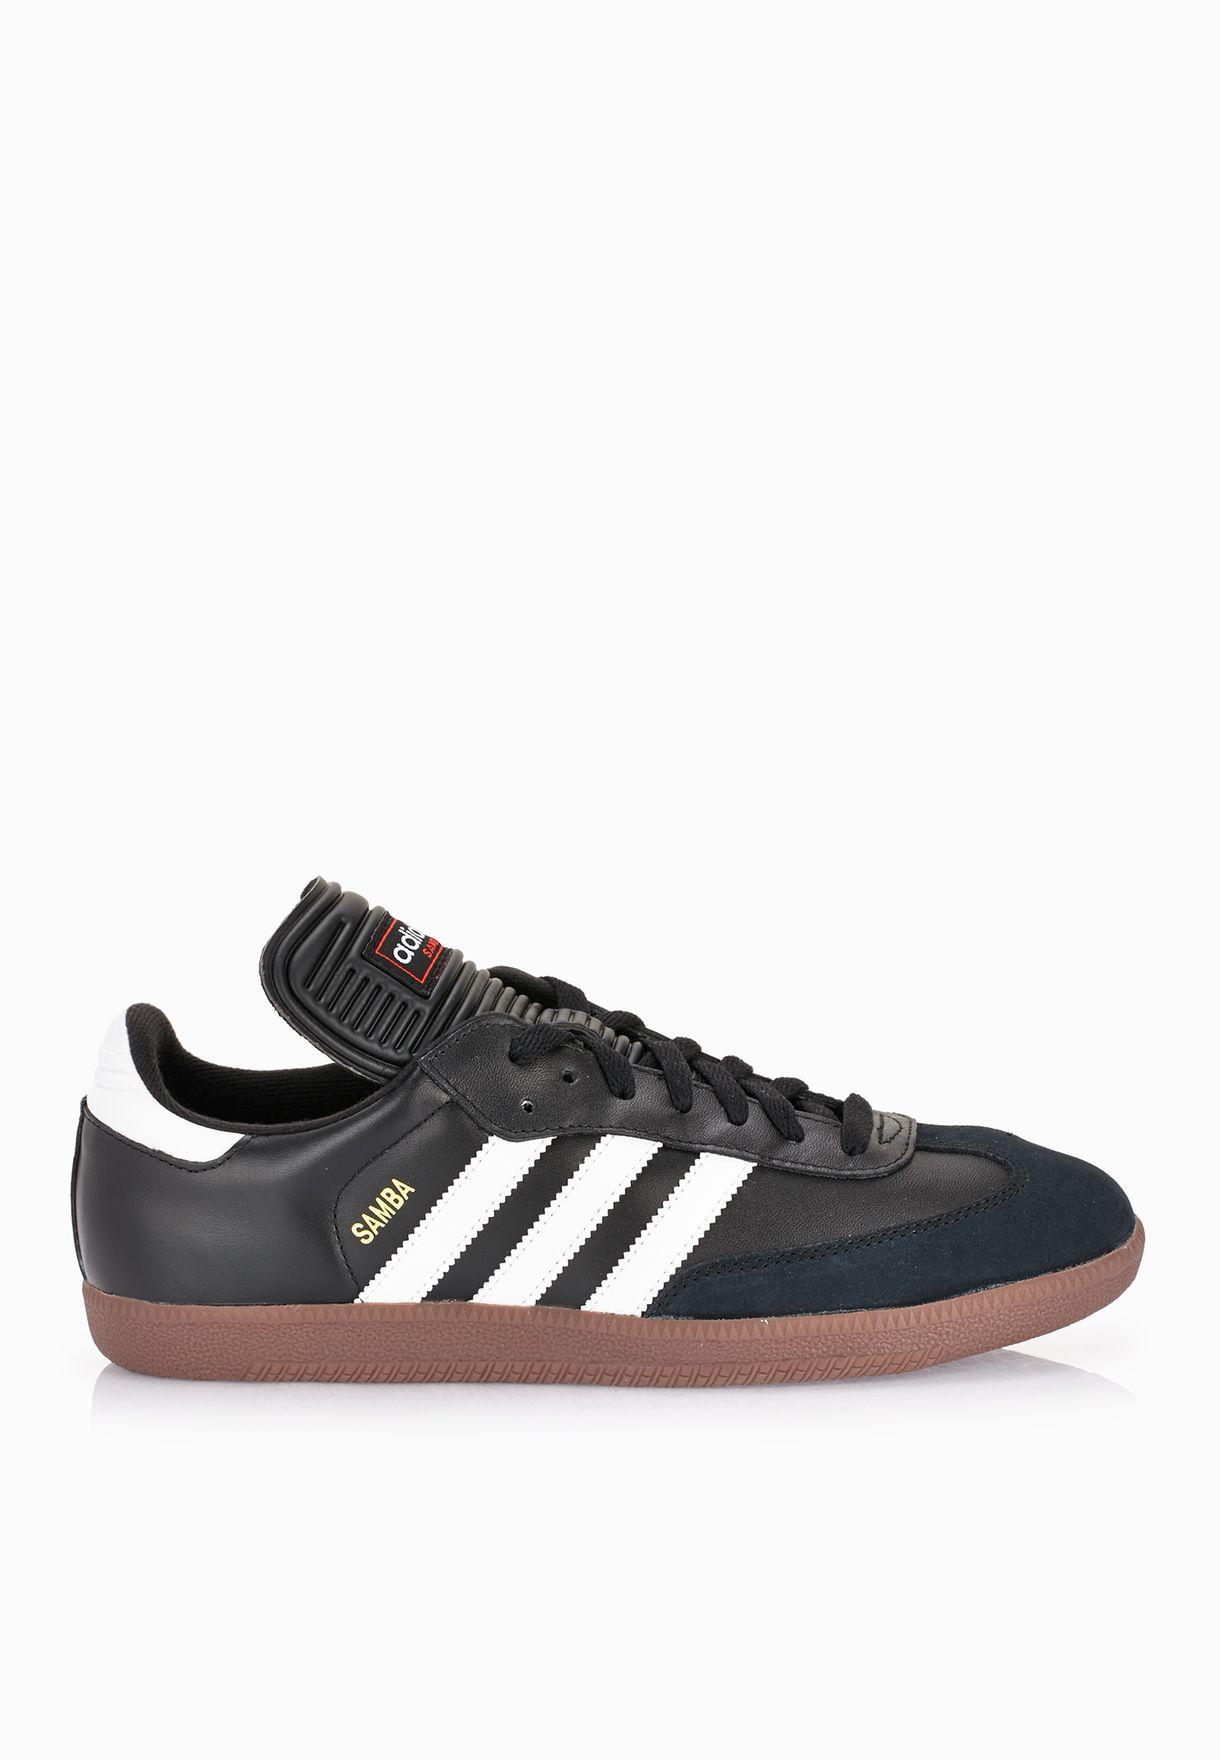 buy popular f2b2b 438a6 Shop adidas black Samba Classic 034563 for Men in Kuwait - A